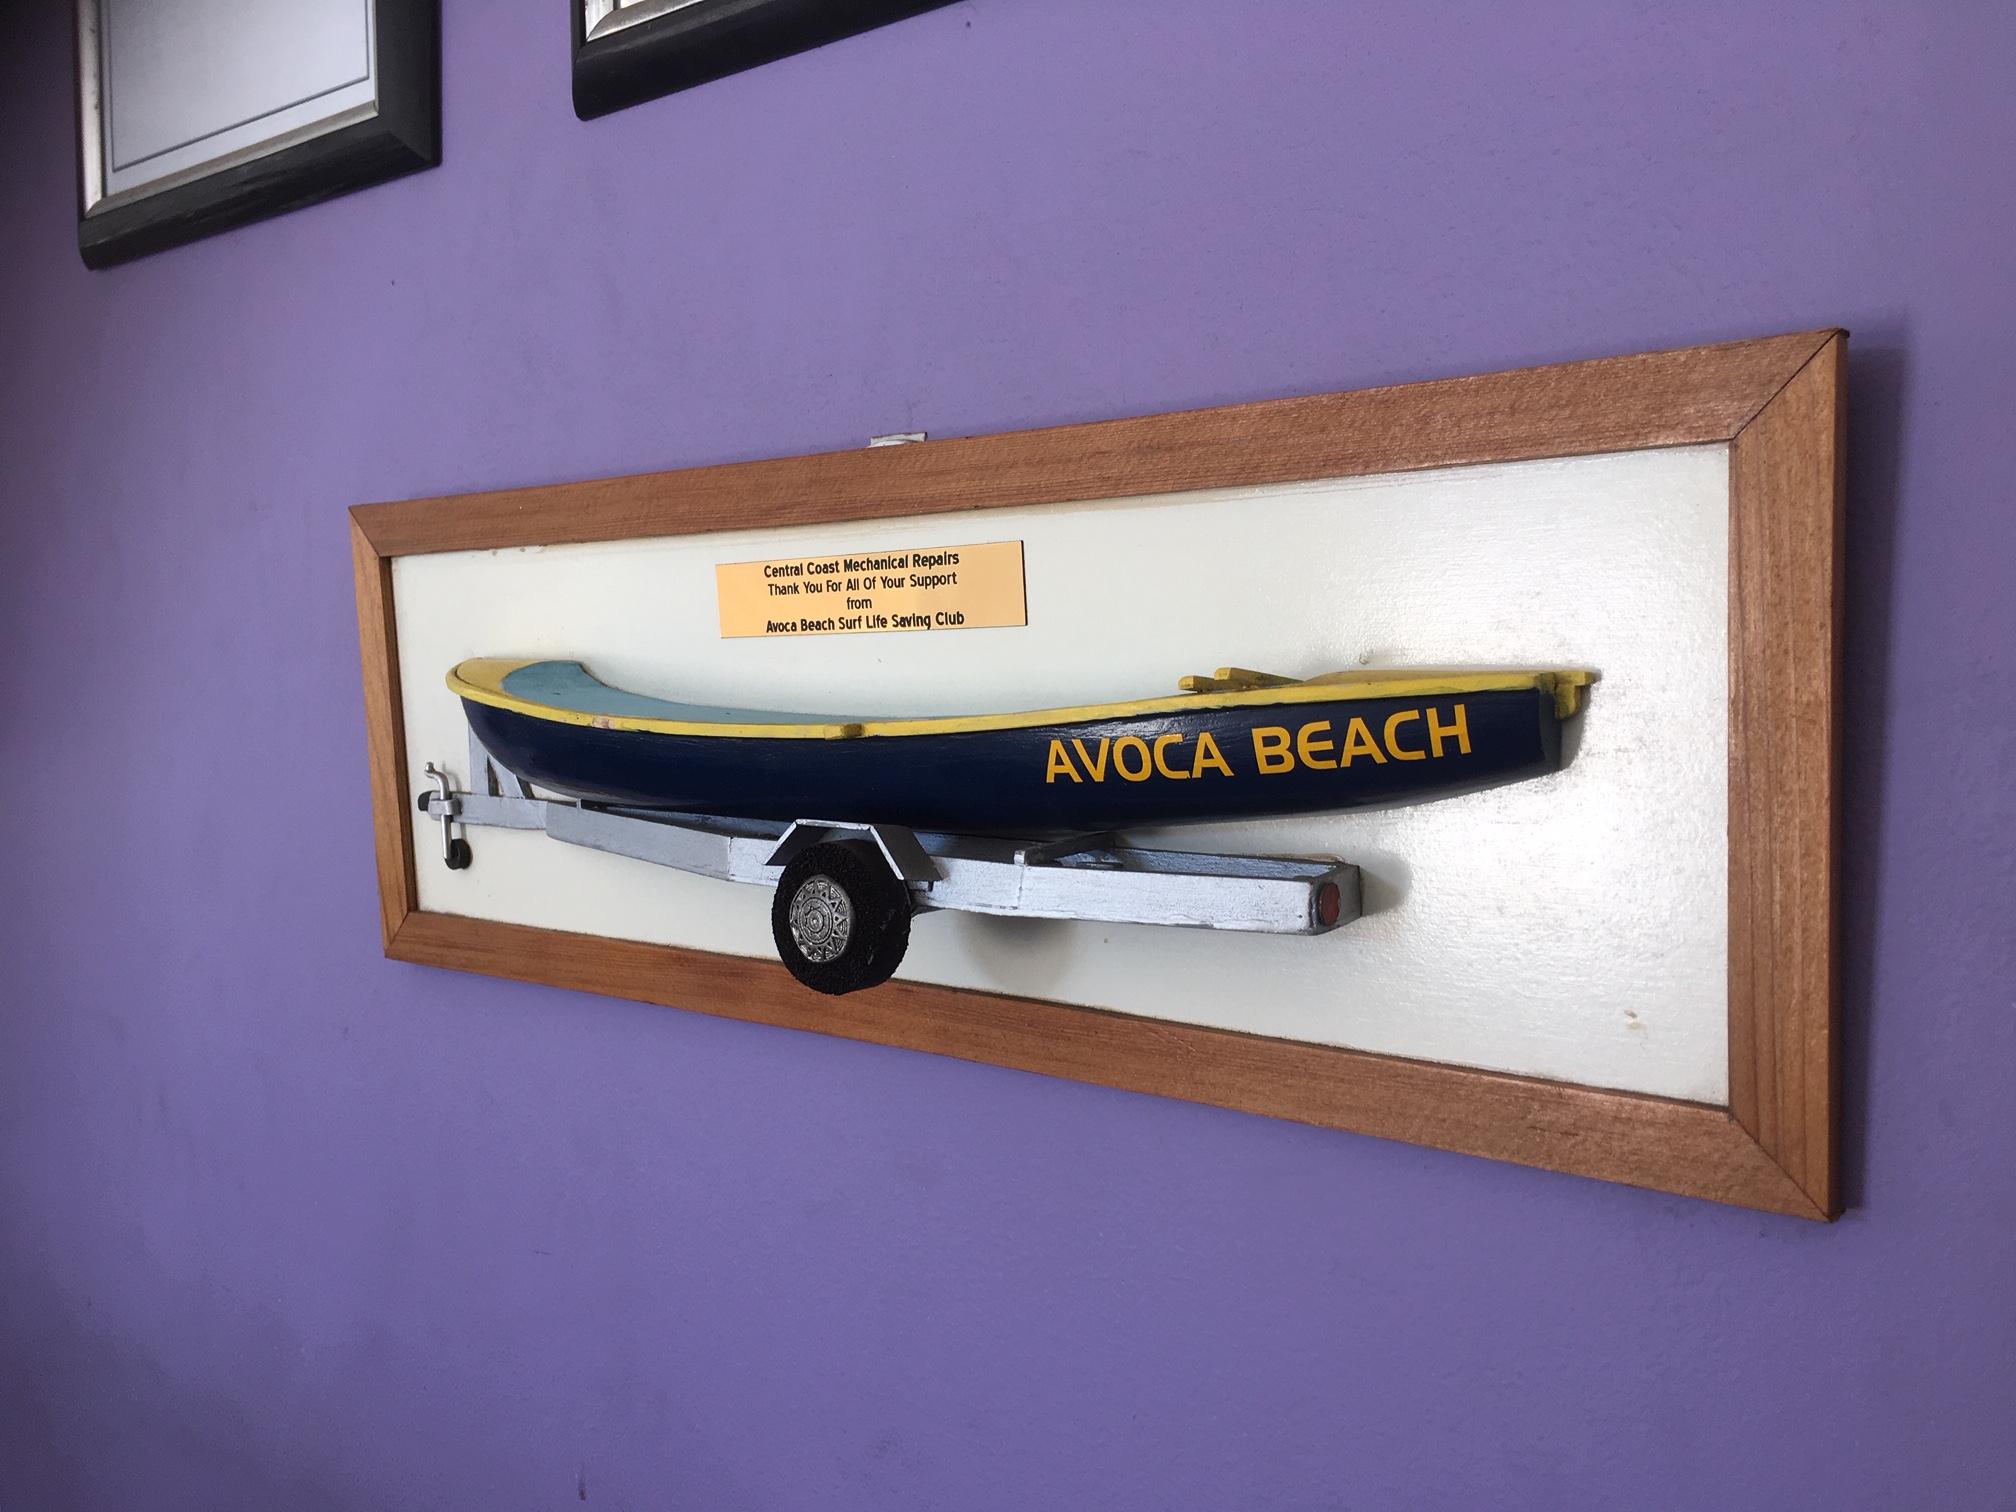 Sponsor boat and trailer